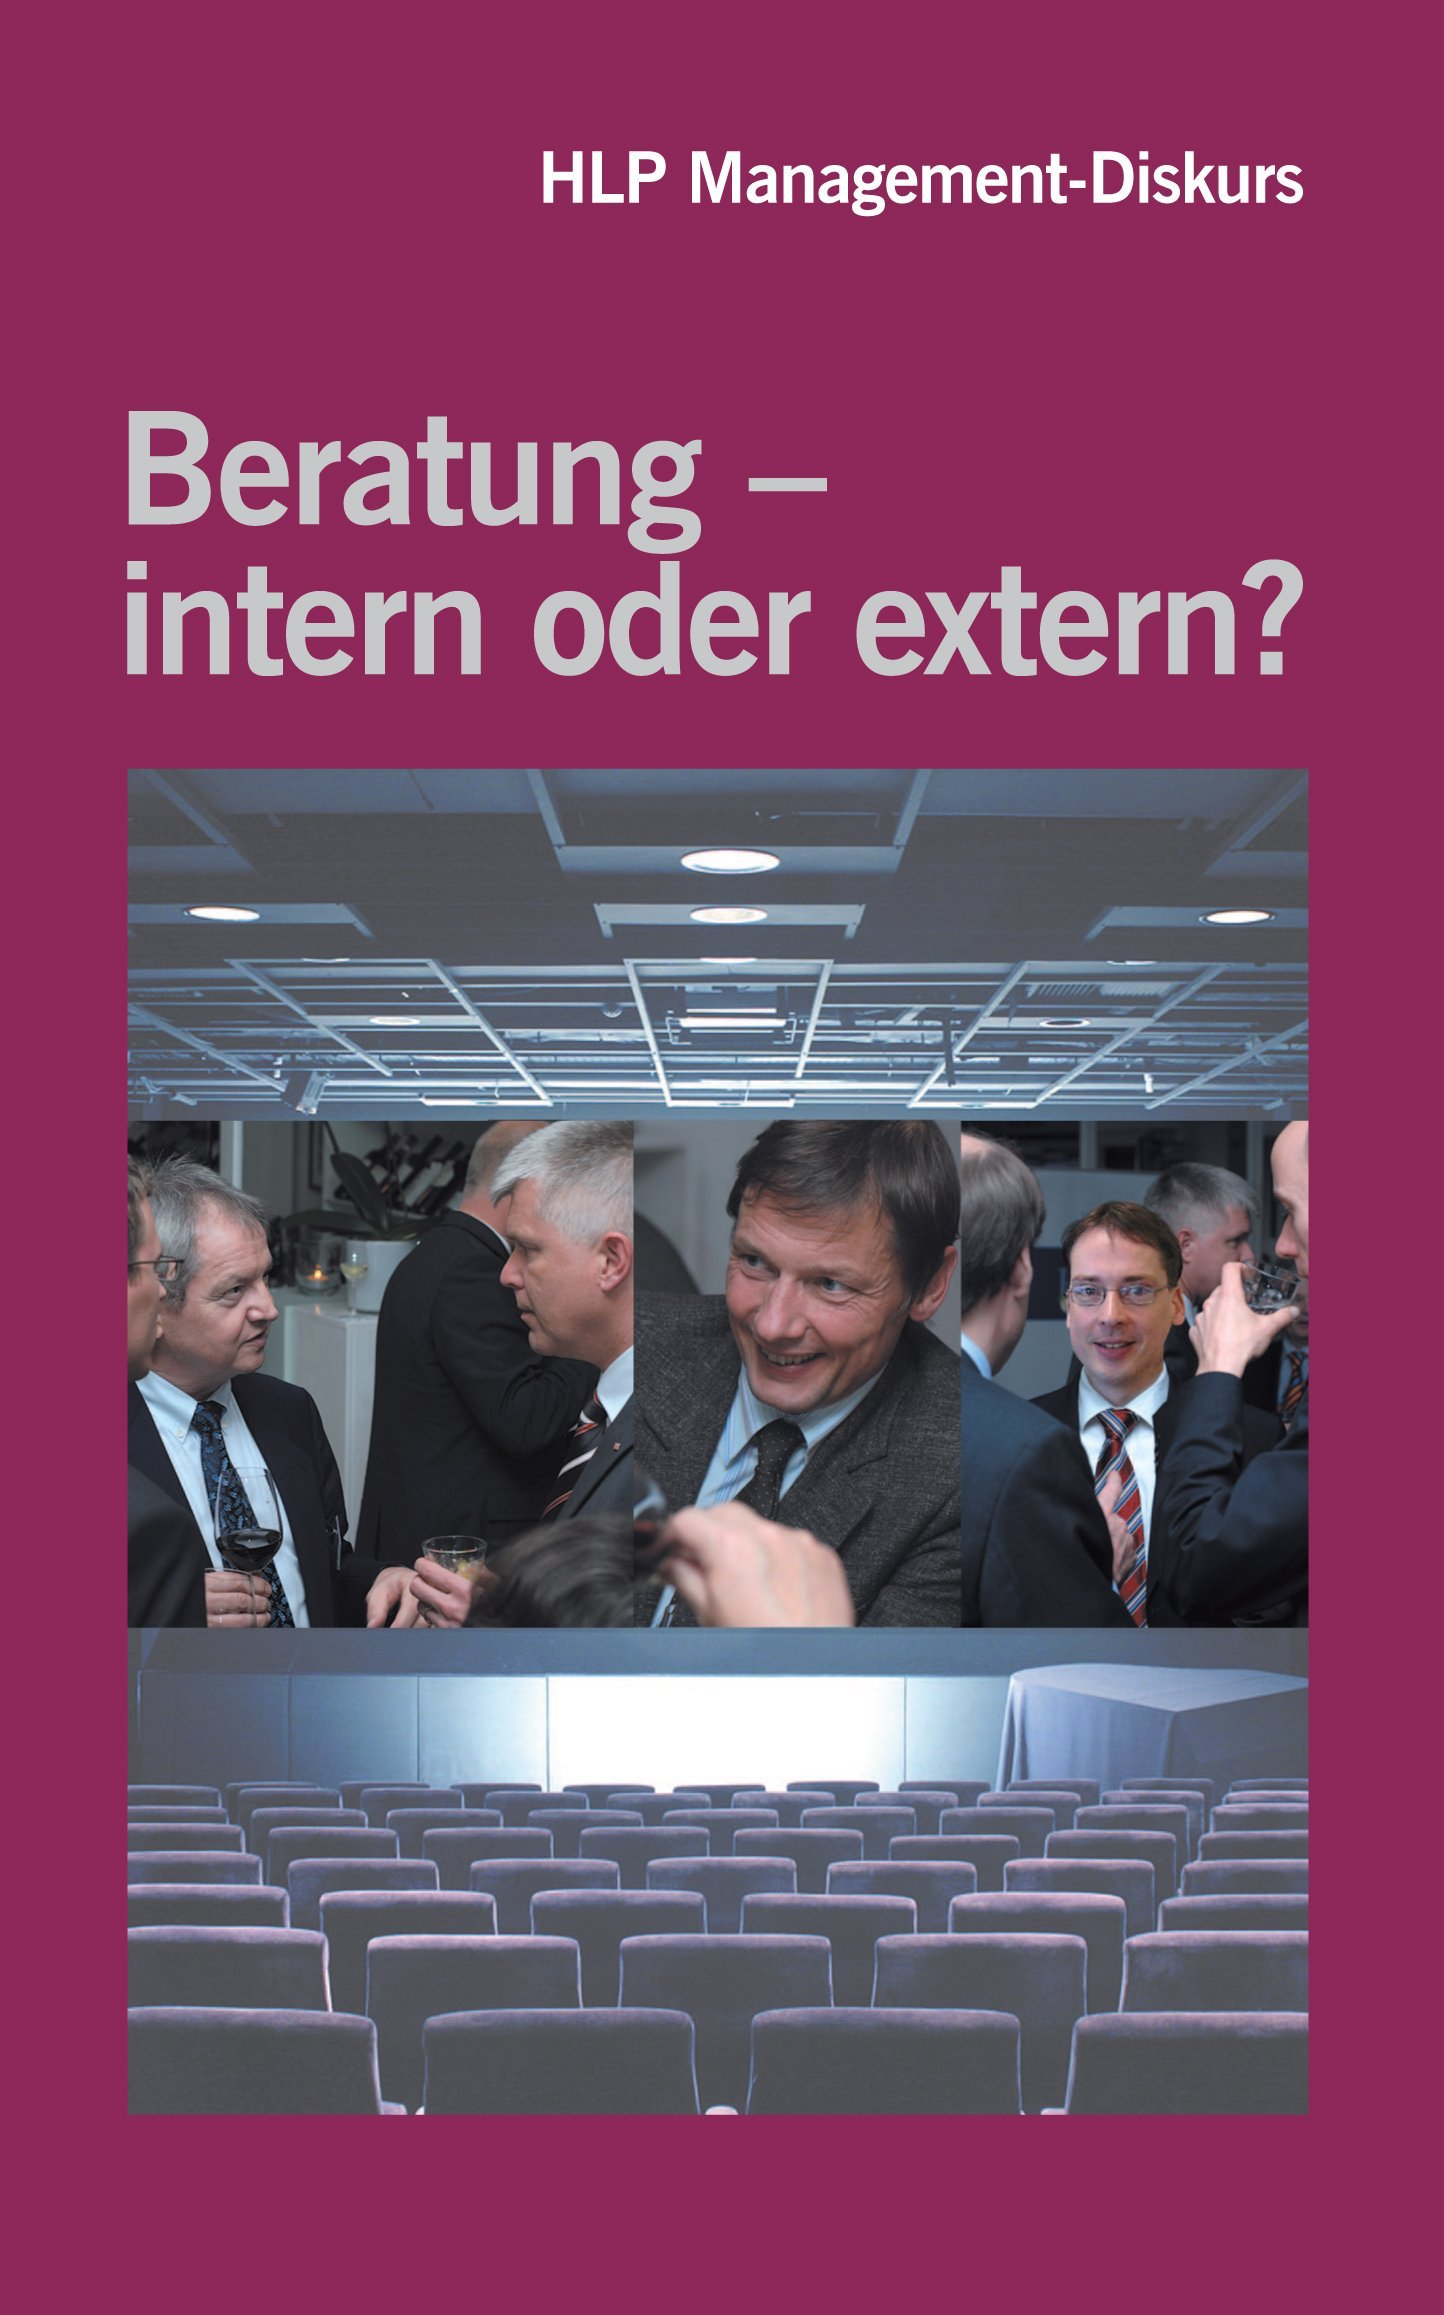 Beratung – intern oder extern.jpg